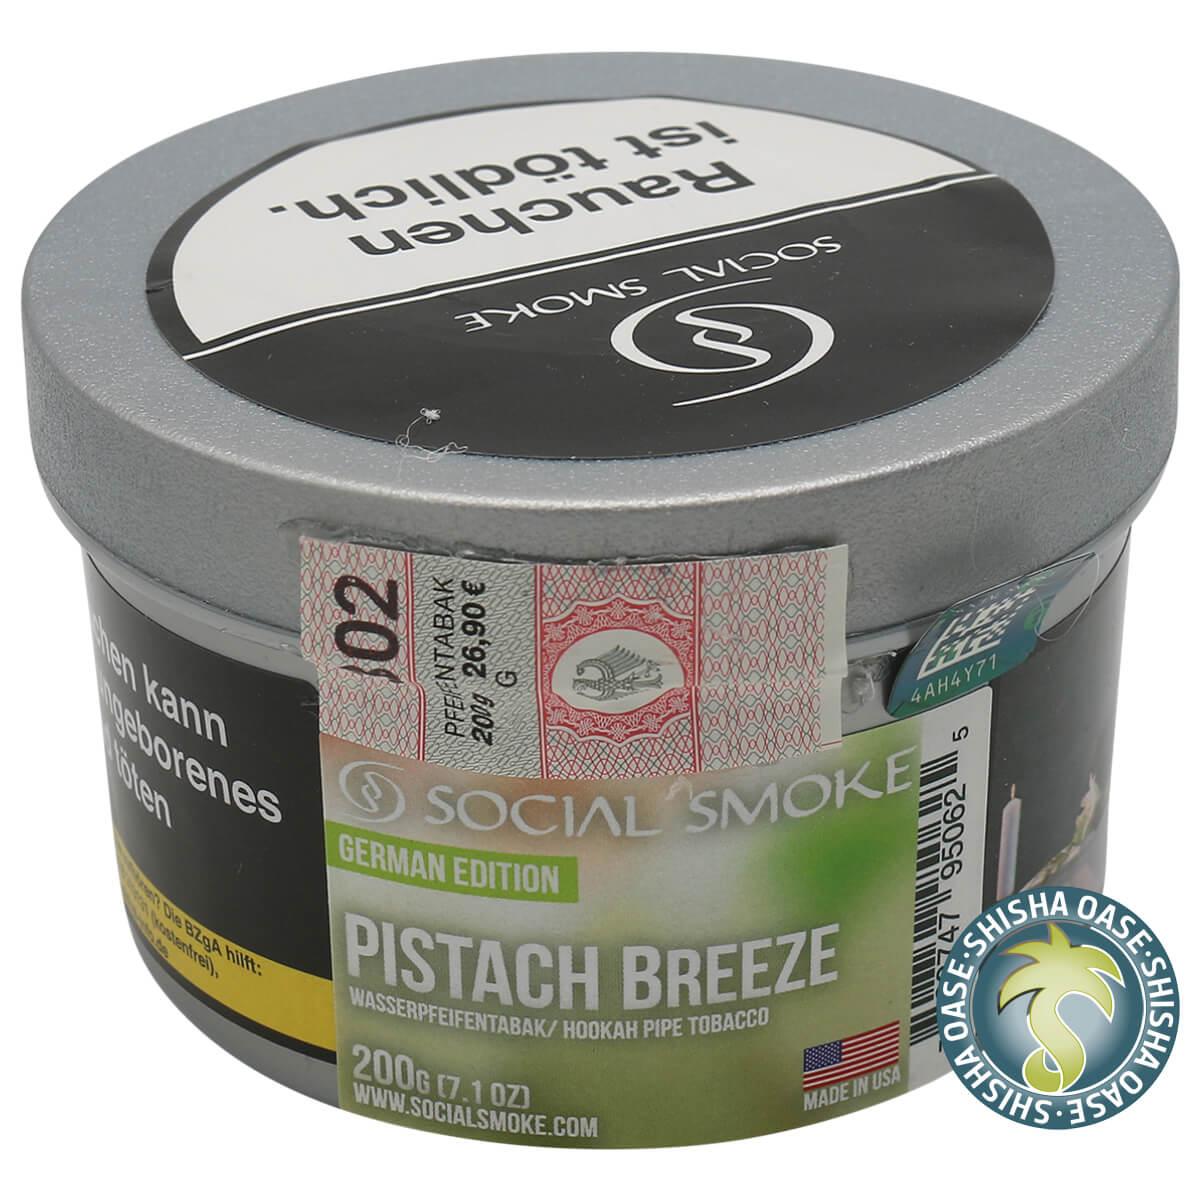 Social Smoke Tabak Pistach Breeze 200g Dose